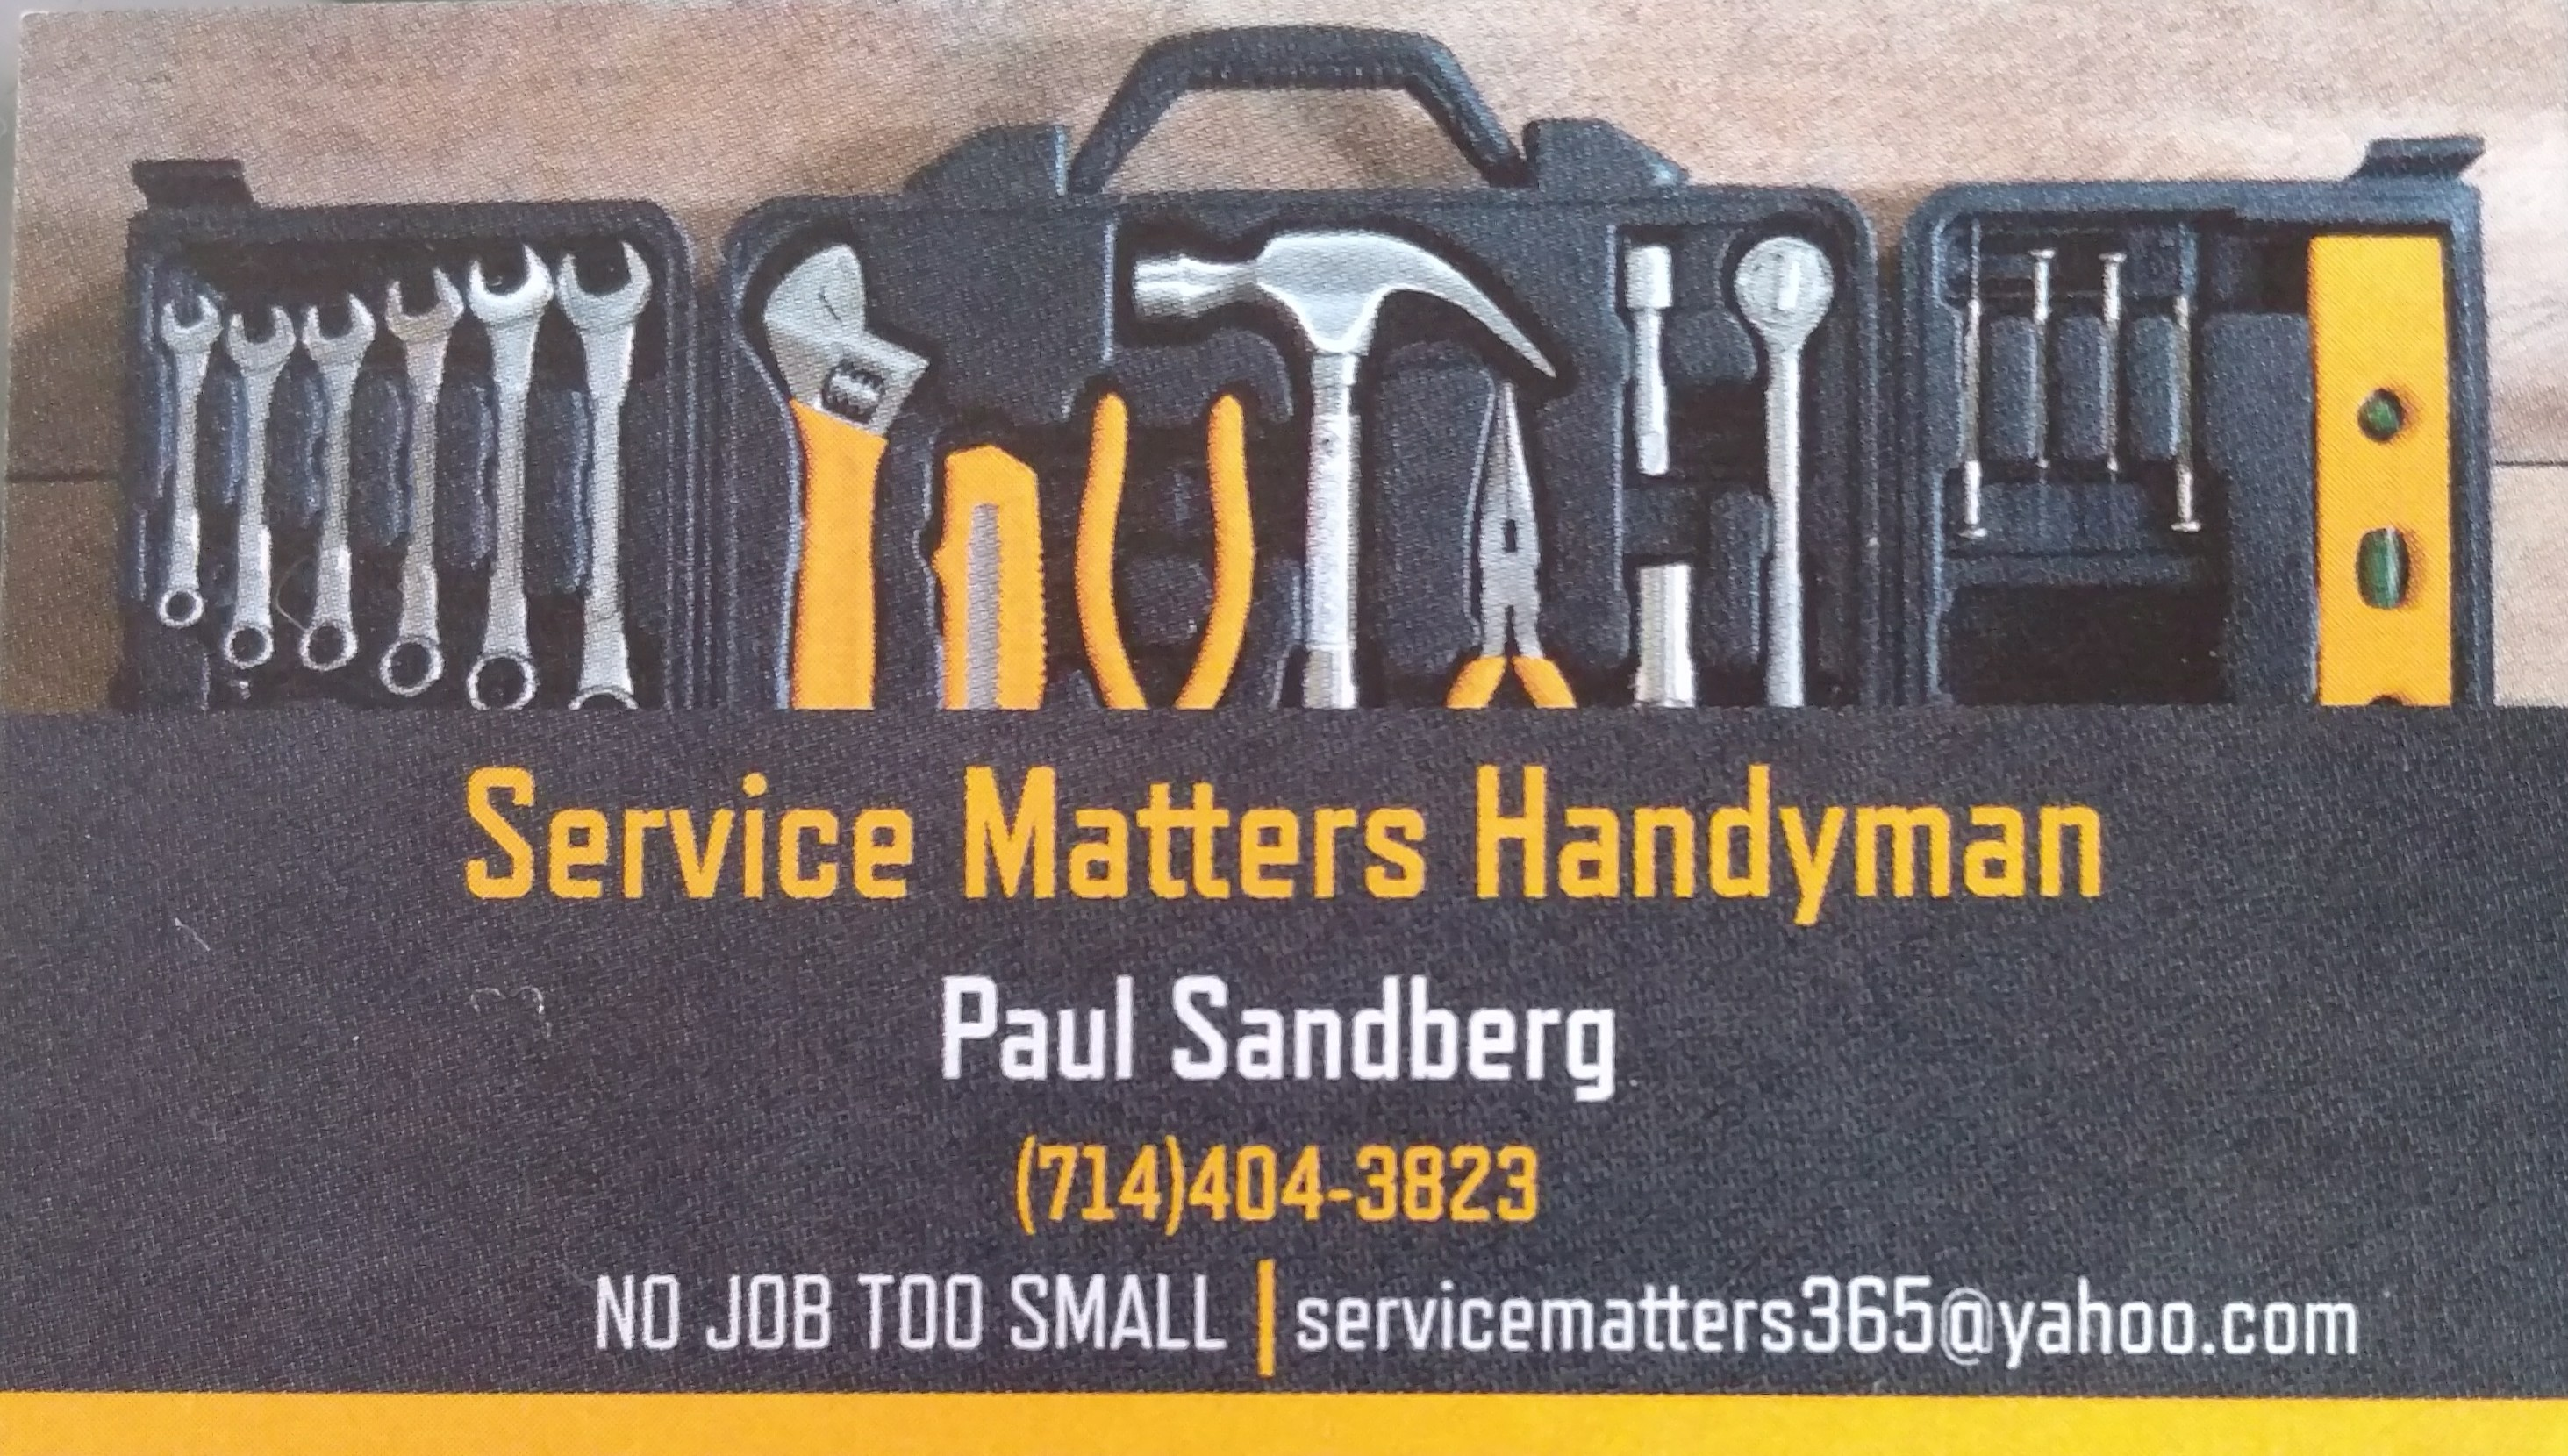 Service Matters Handyman services